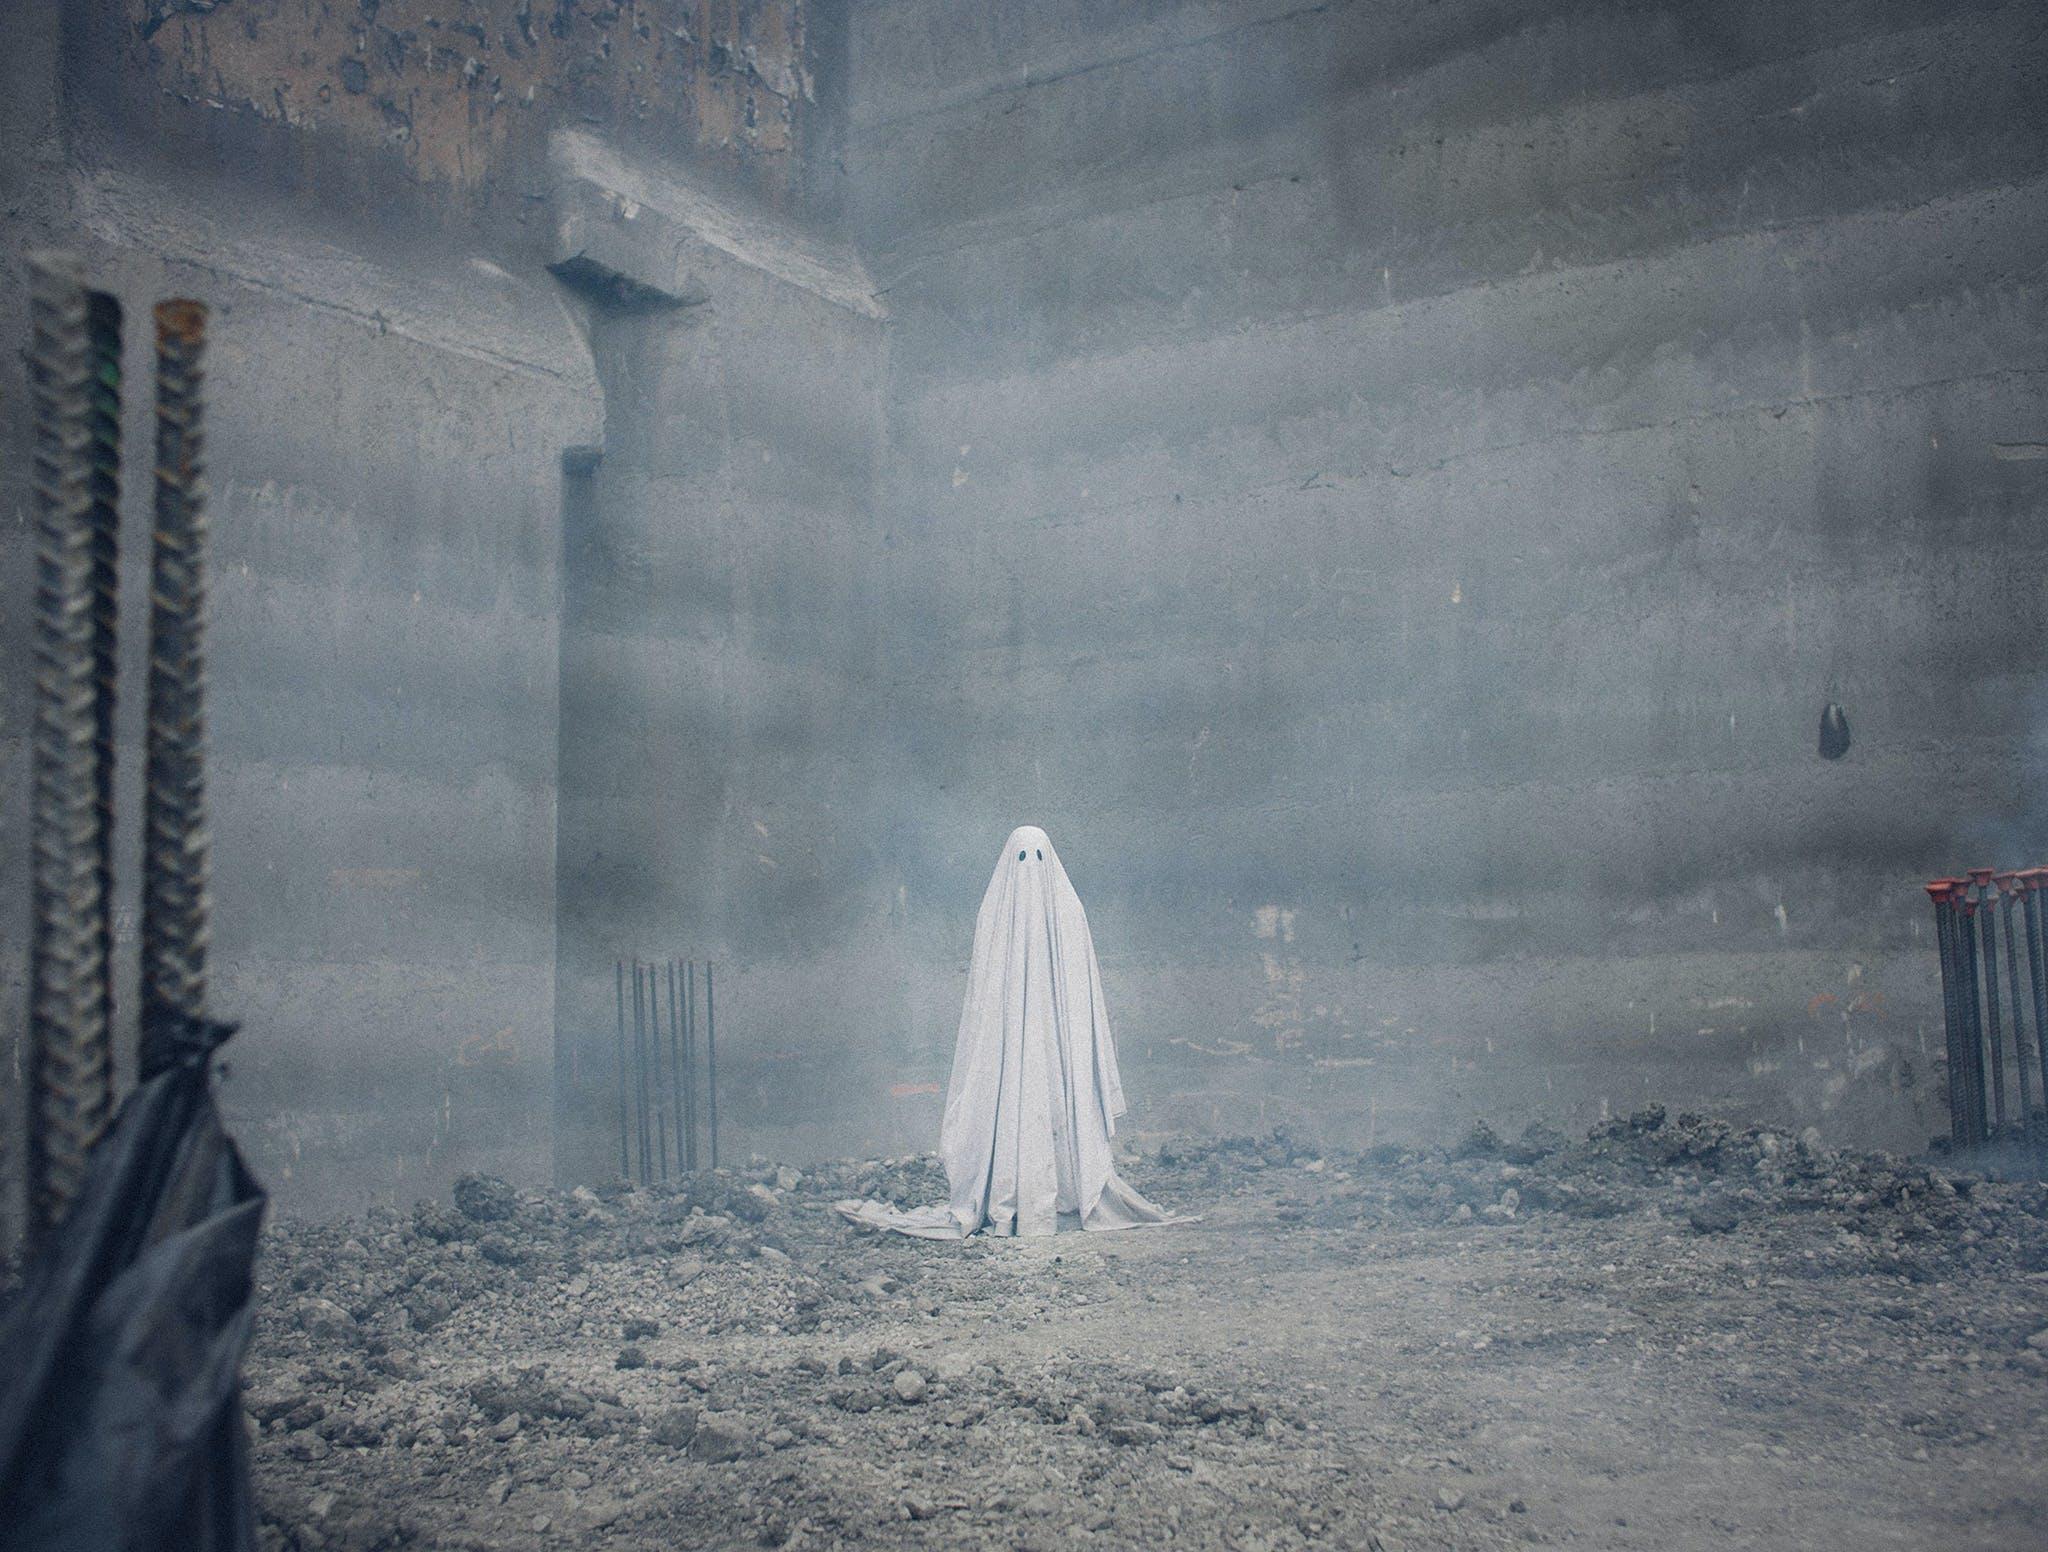 2018 Film Independent Spirit Awards